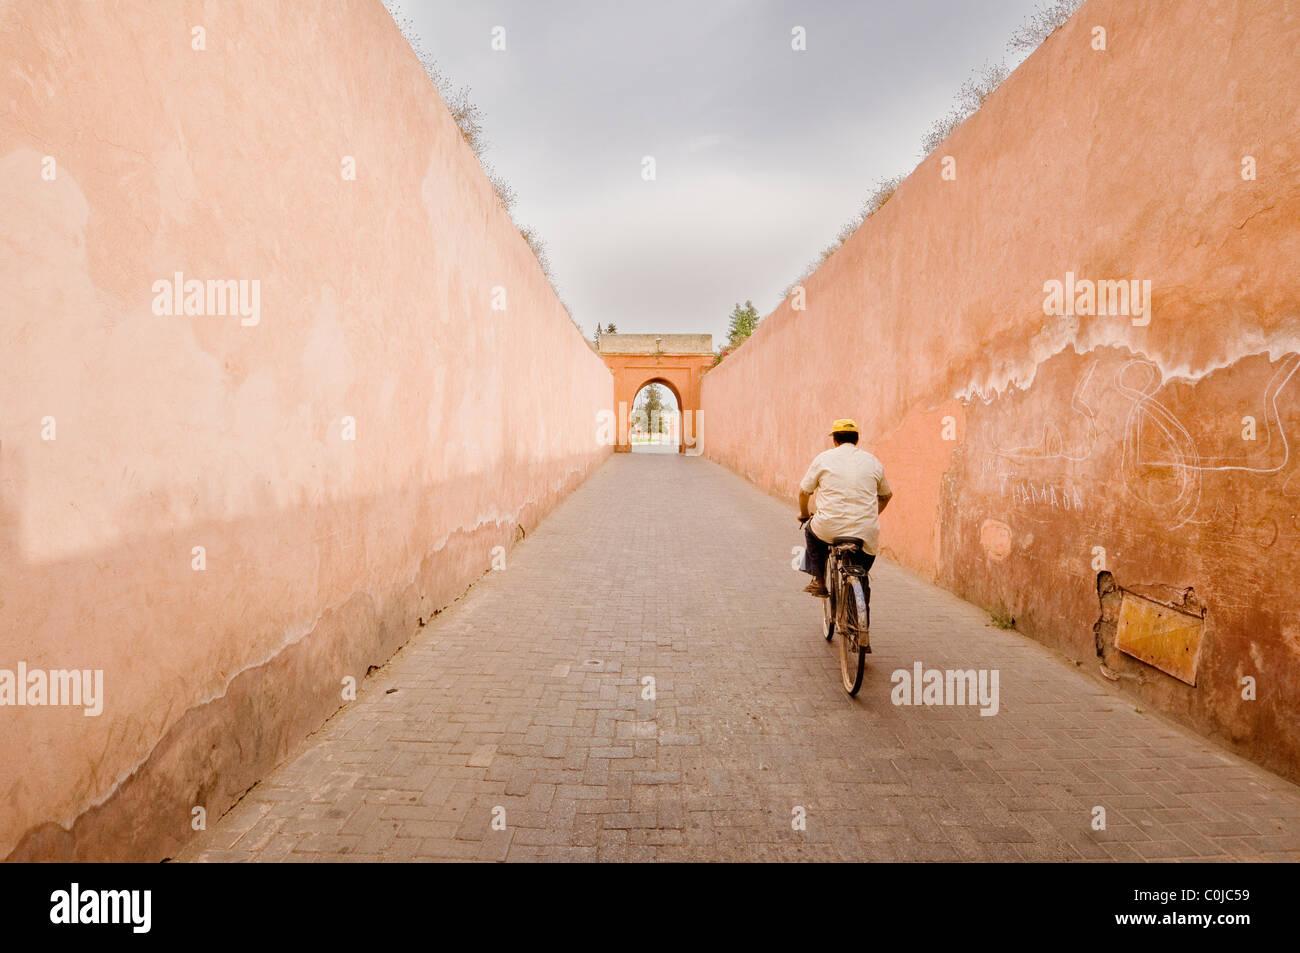 A man exiting the Marrakesh medina on a bicycle. Stock Photo